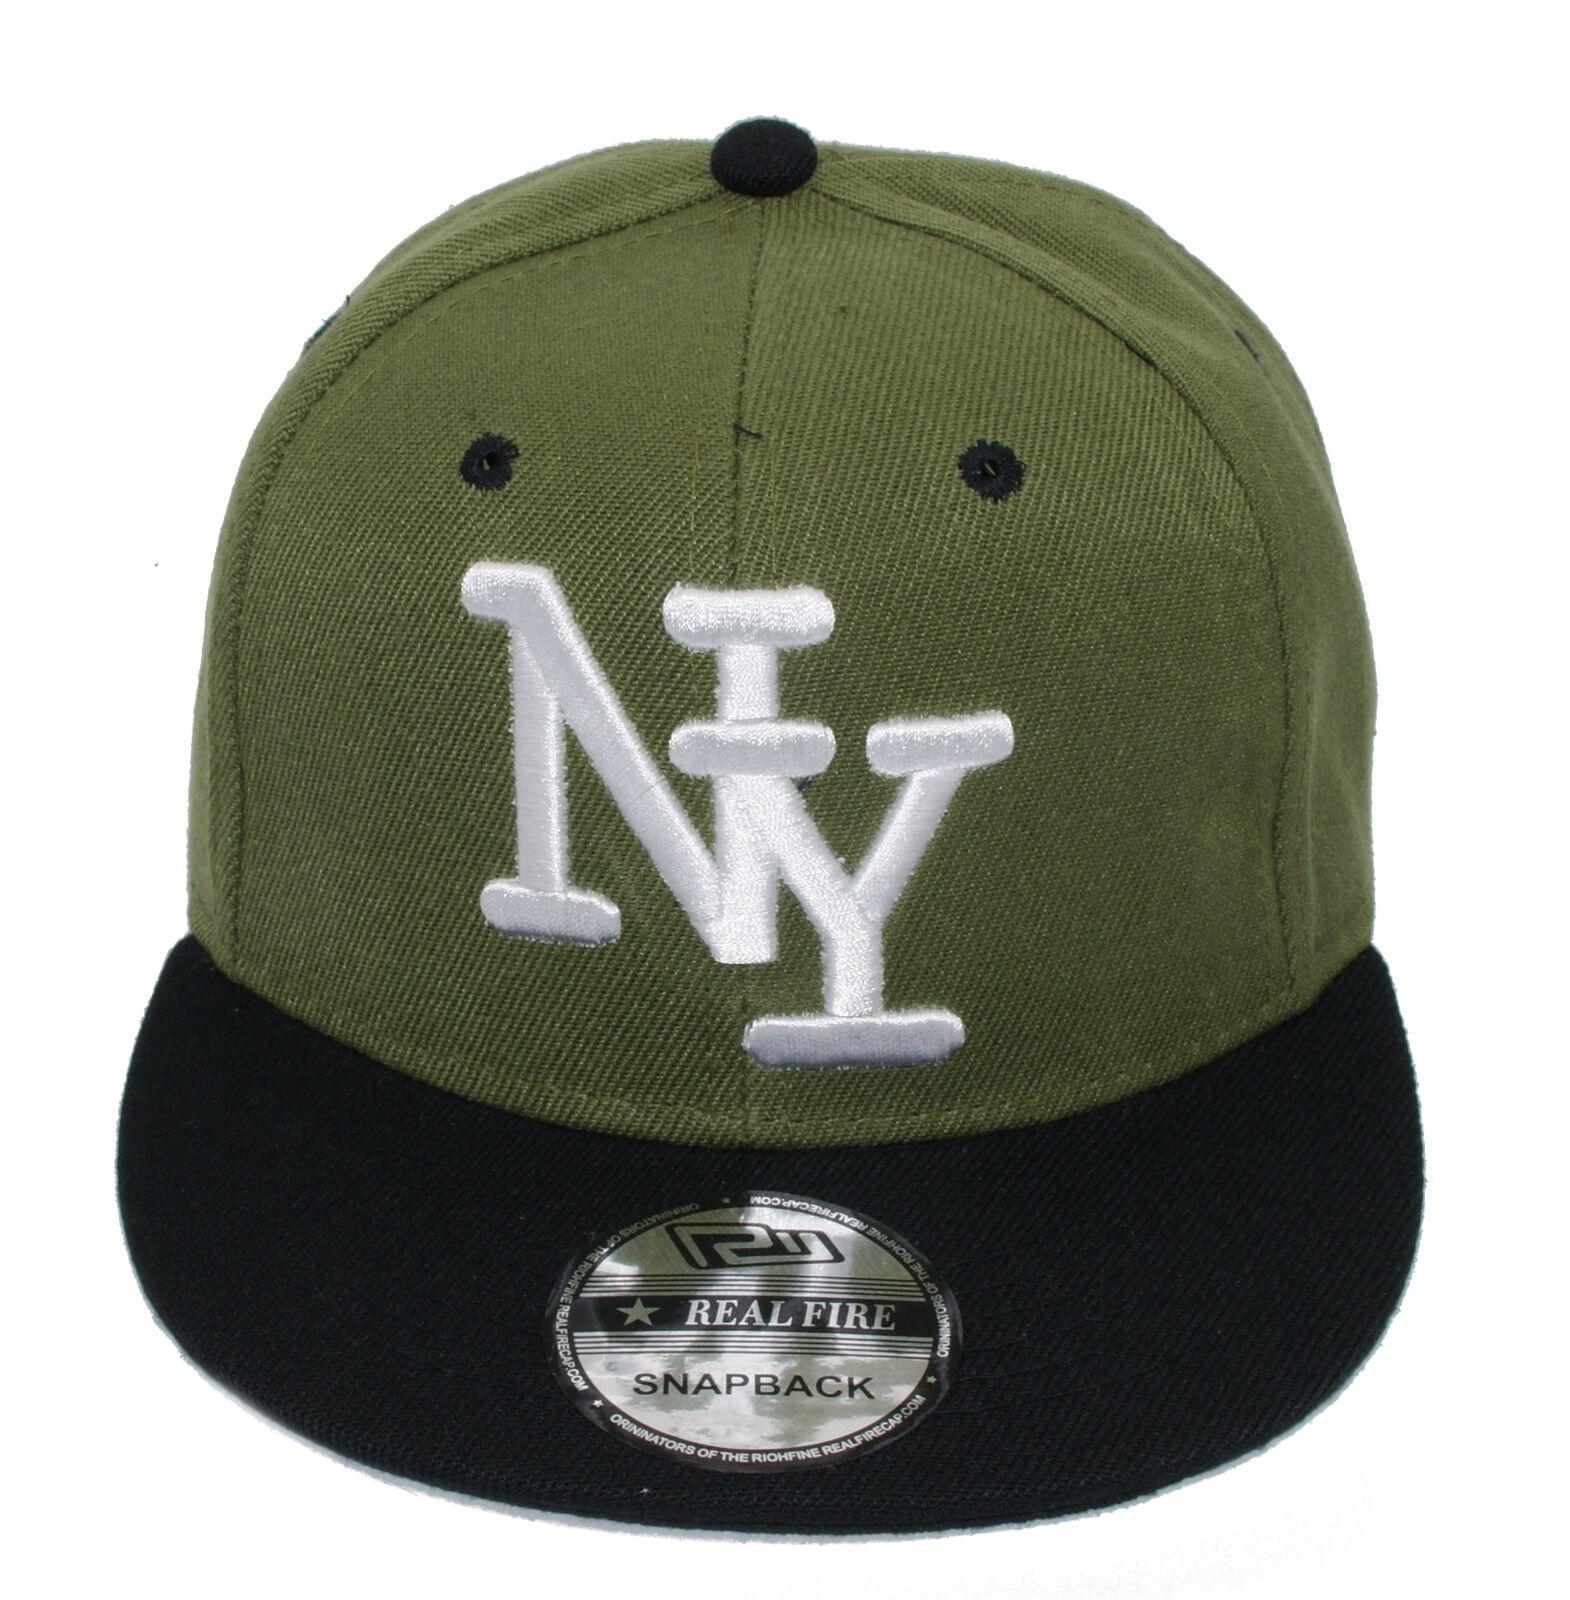 Cappy Cap gerader Schirm Basecap Snapback Kappe Schirmmütze NY Oliv grün Herren